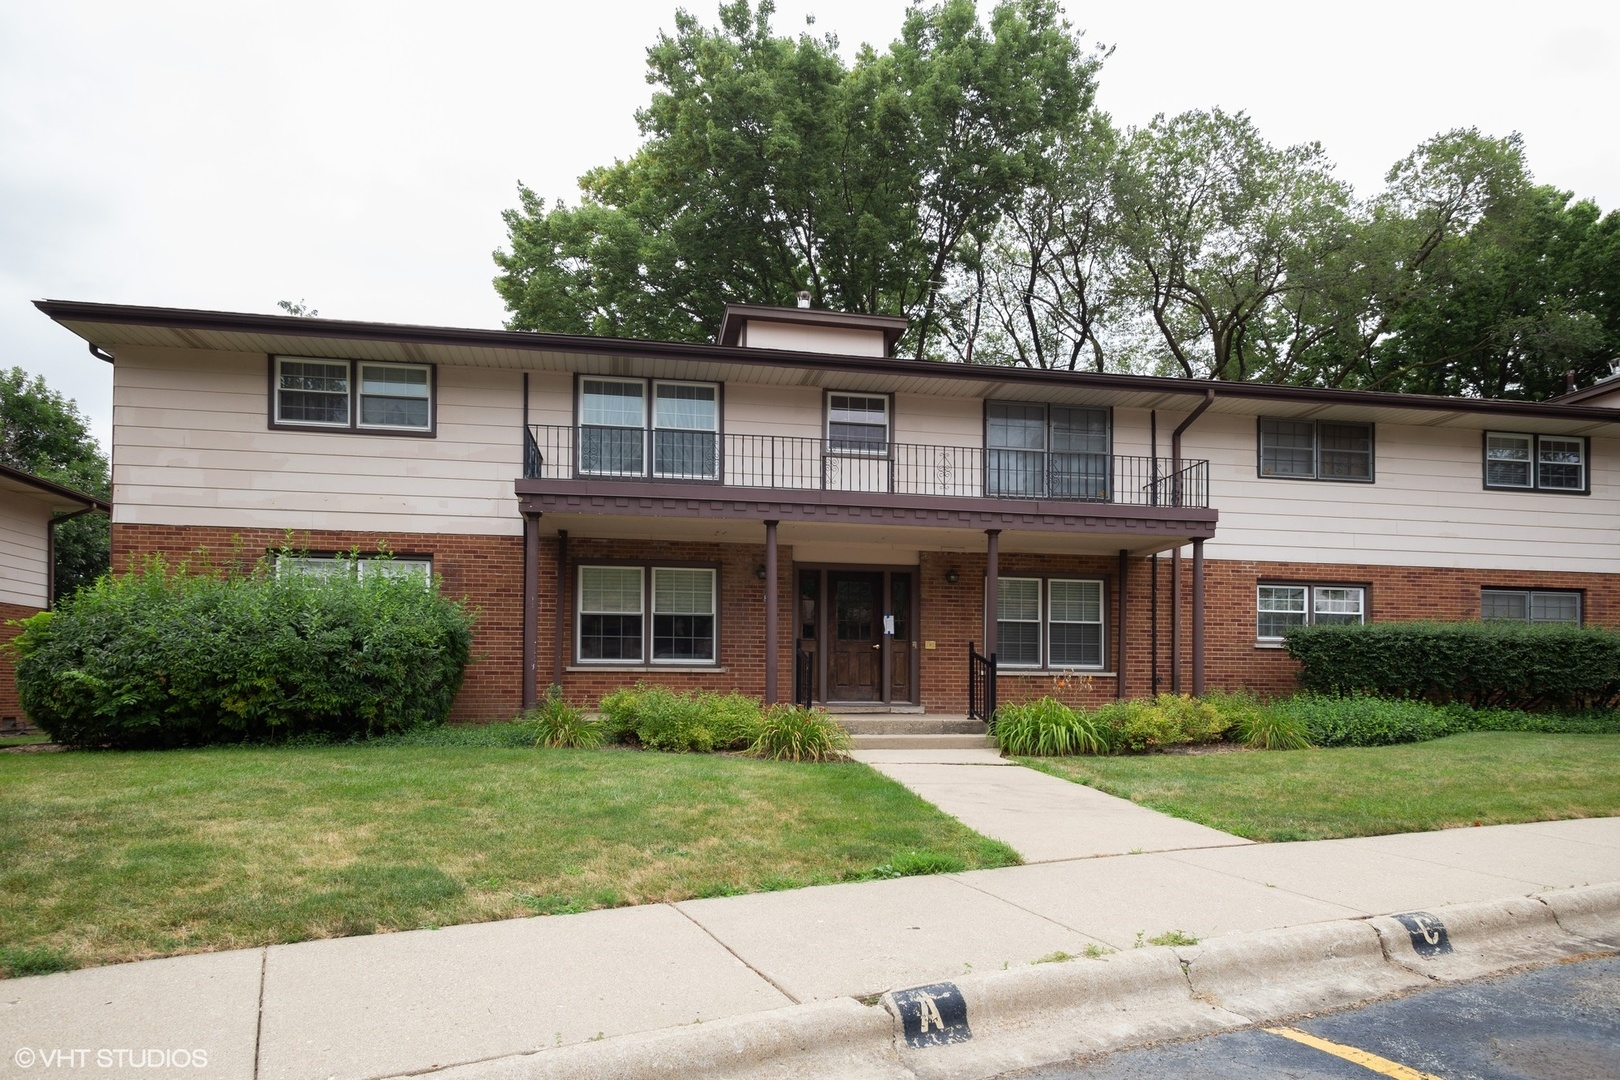 224 Washington B, ELK GROVE VILLAGE, Illinois, 60007